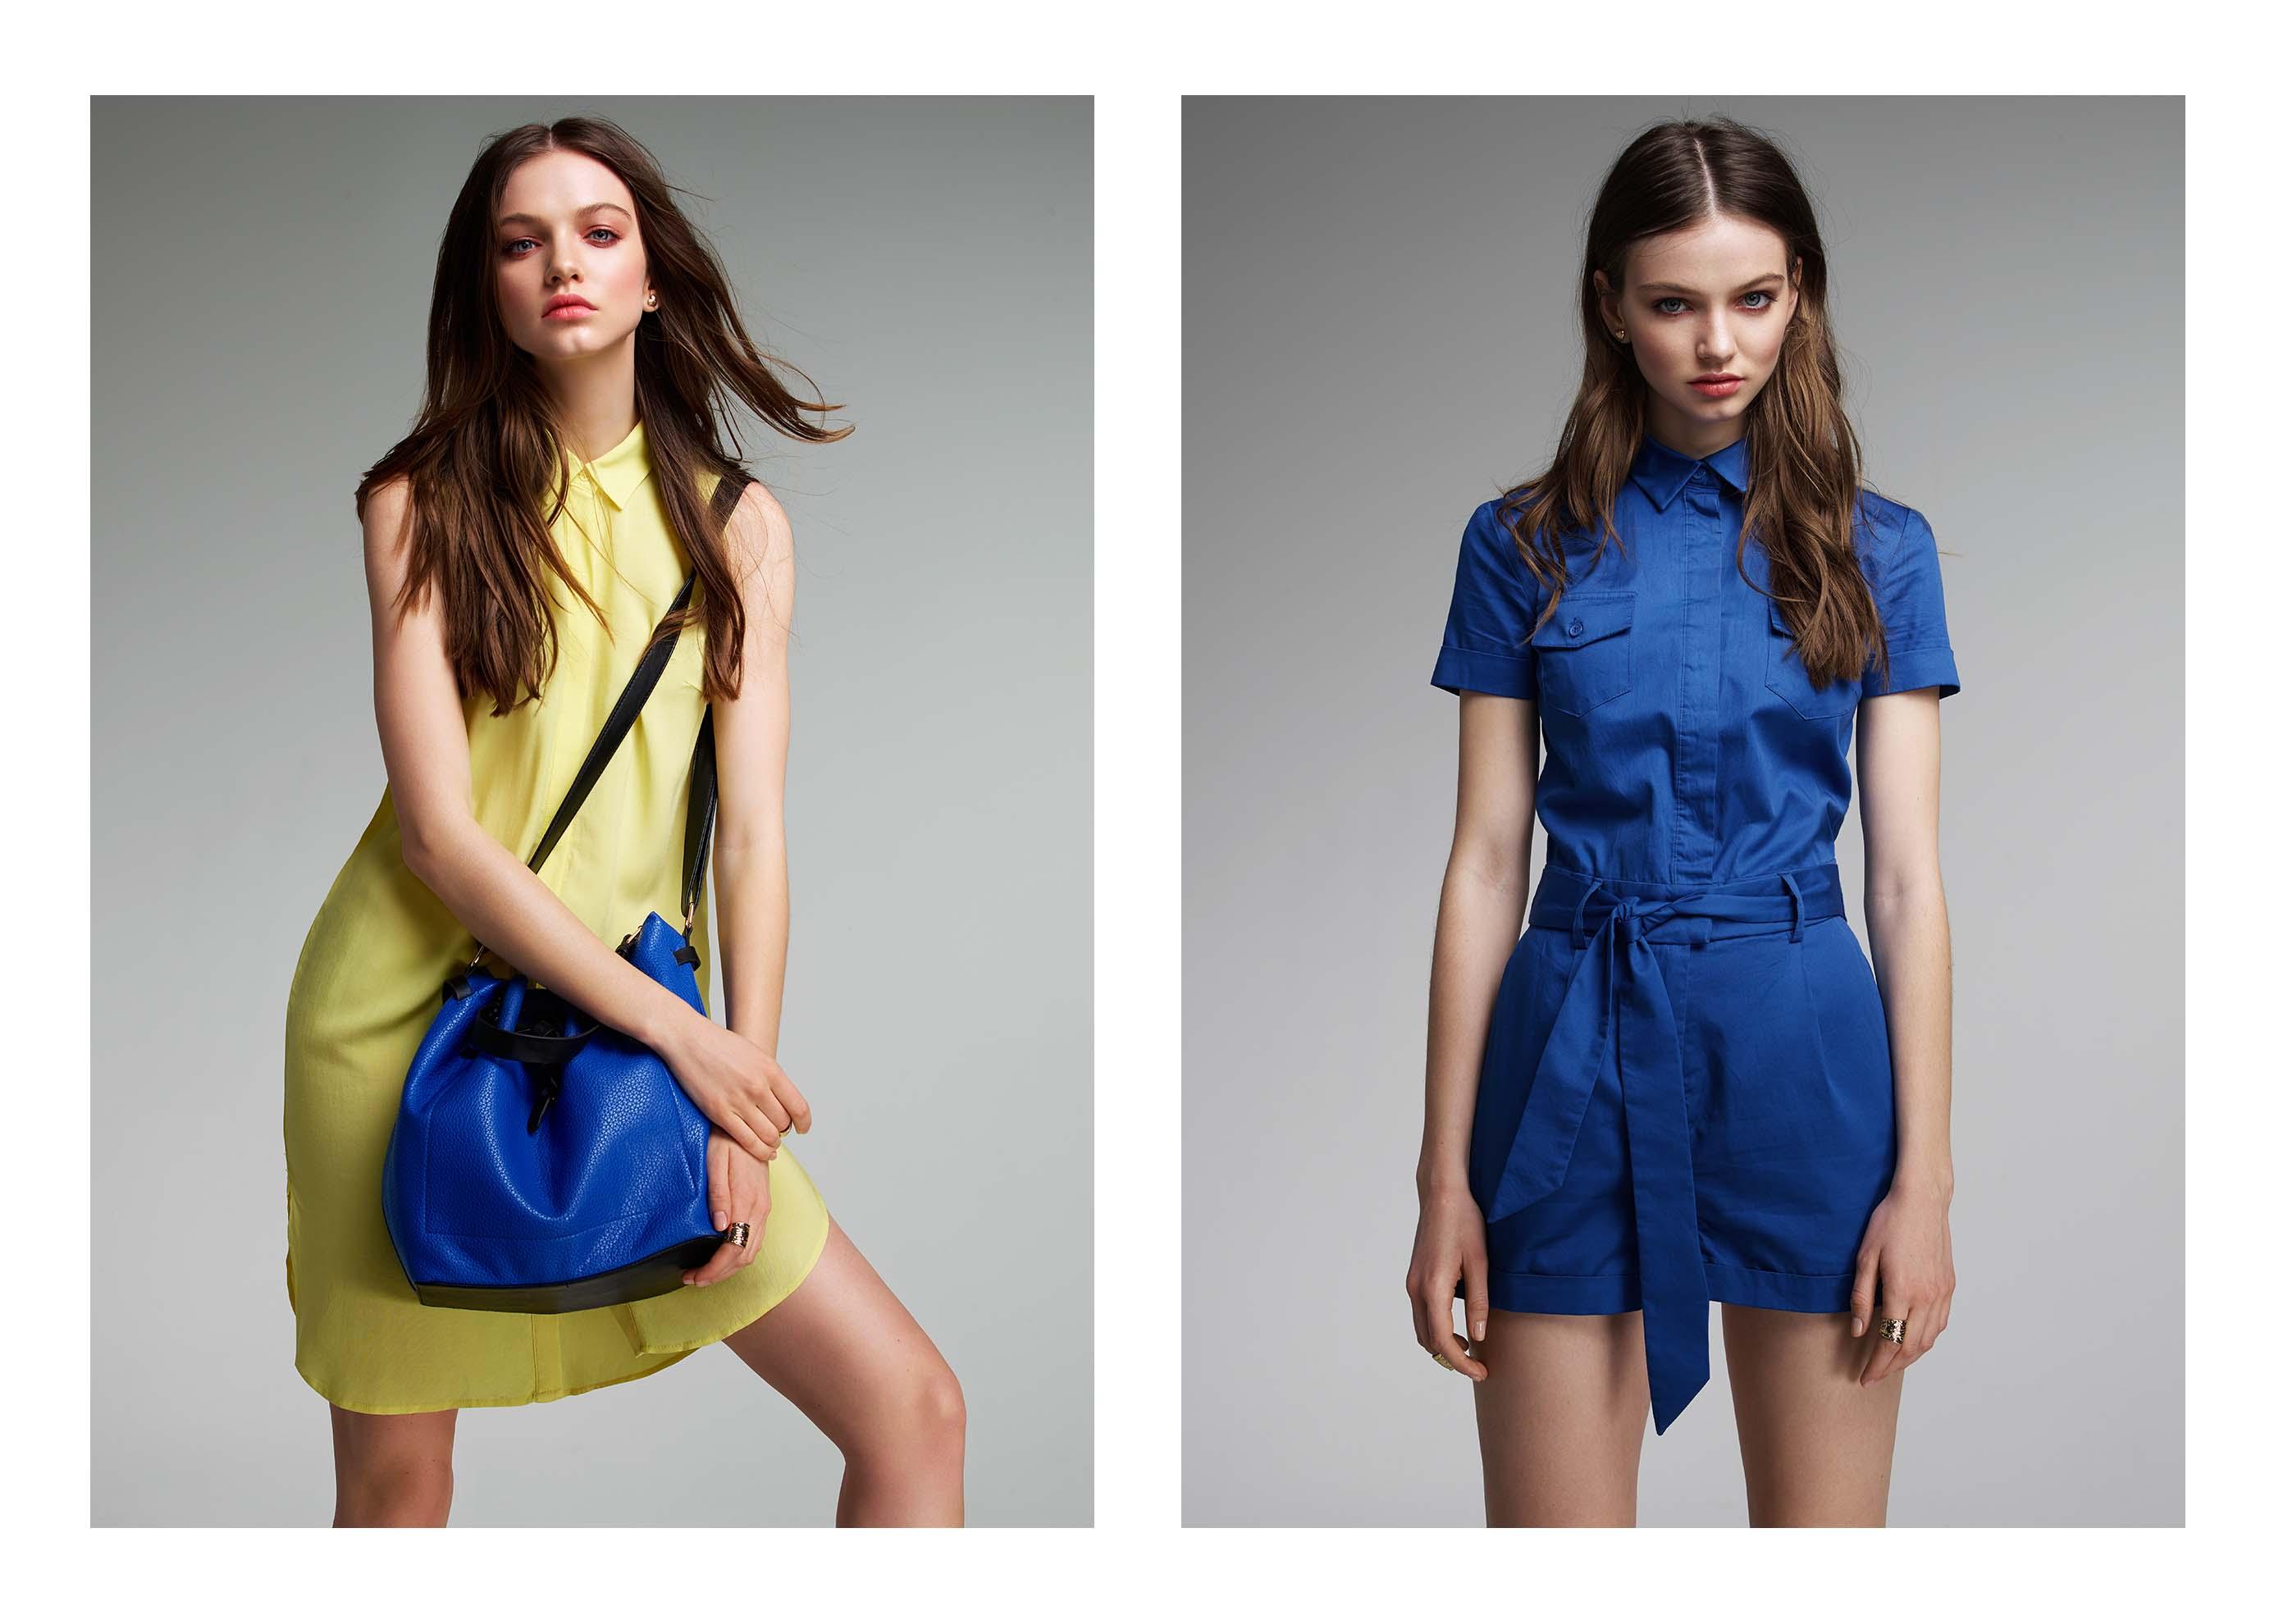 ЕВГЕНИЯ ВОРОНОВА – Concept Club Lookbook SS'15 Daria Sergeeva Avant models – EVGENIA VORONOVA